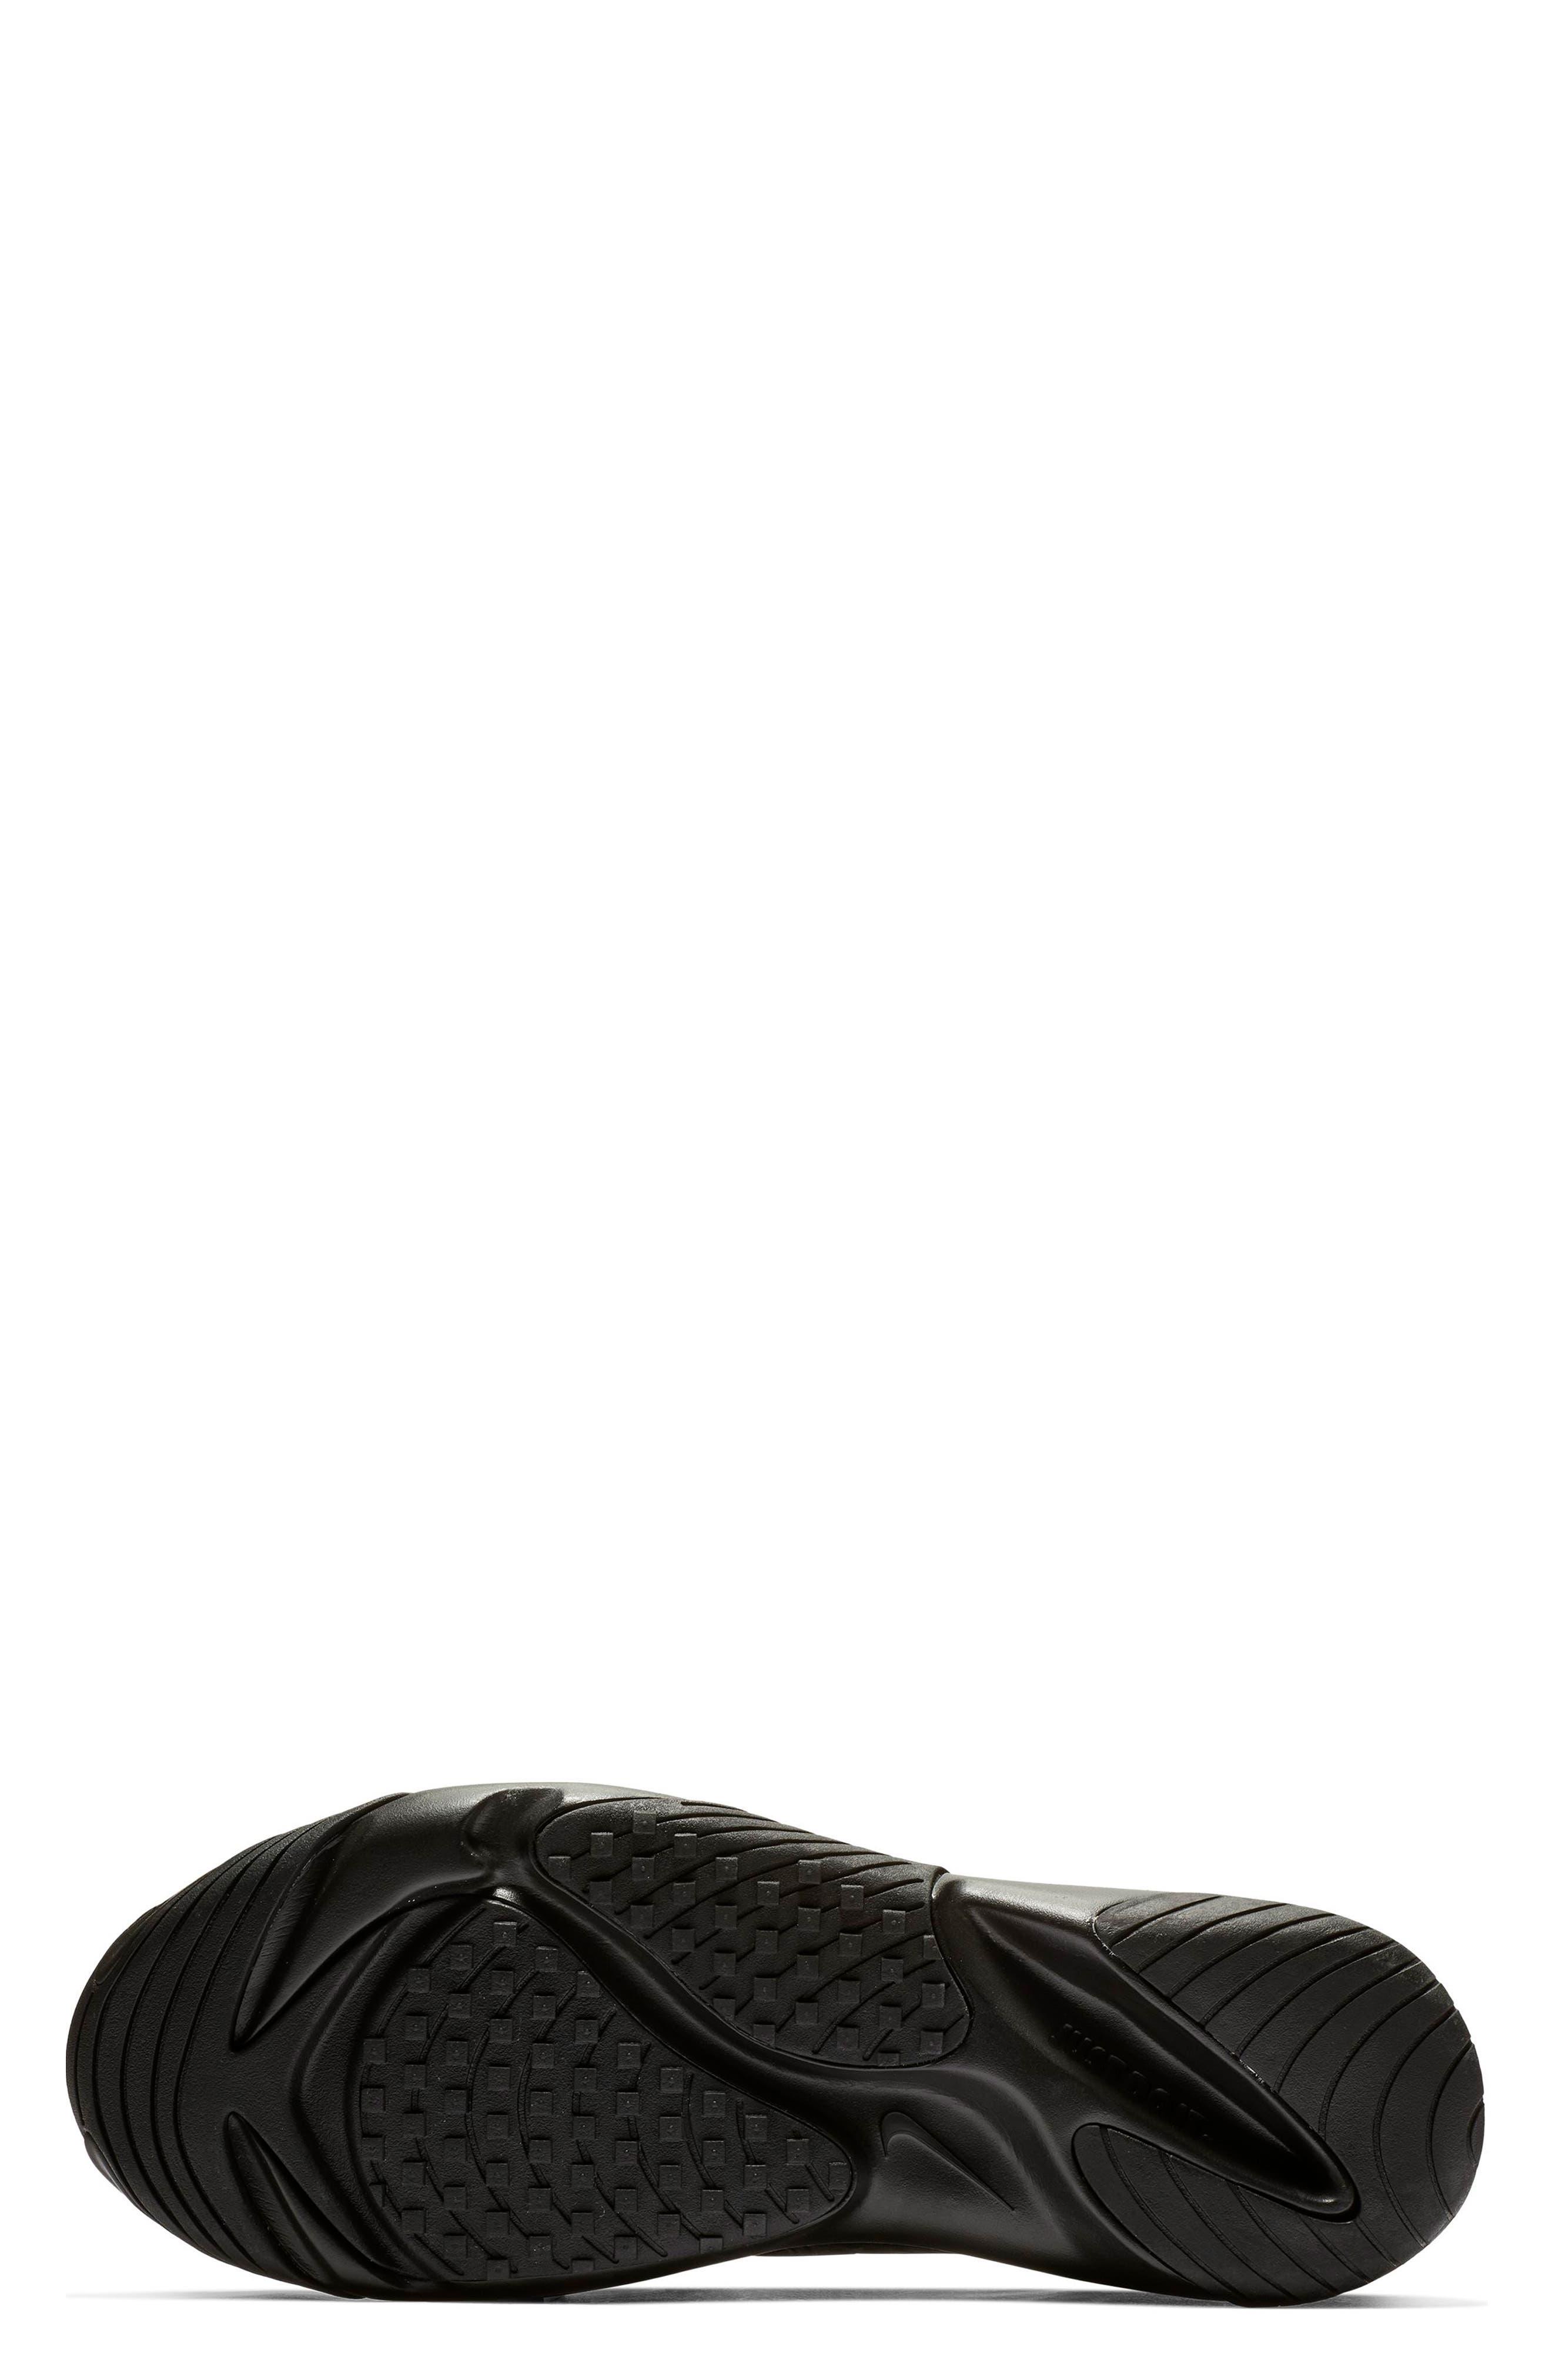 Zoom 2K Sneaker,                             Alternate thumbnail 5, color,                             BLACK/ BLACK/ ANTHRACITE